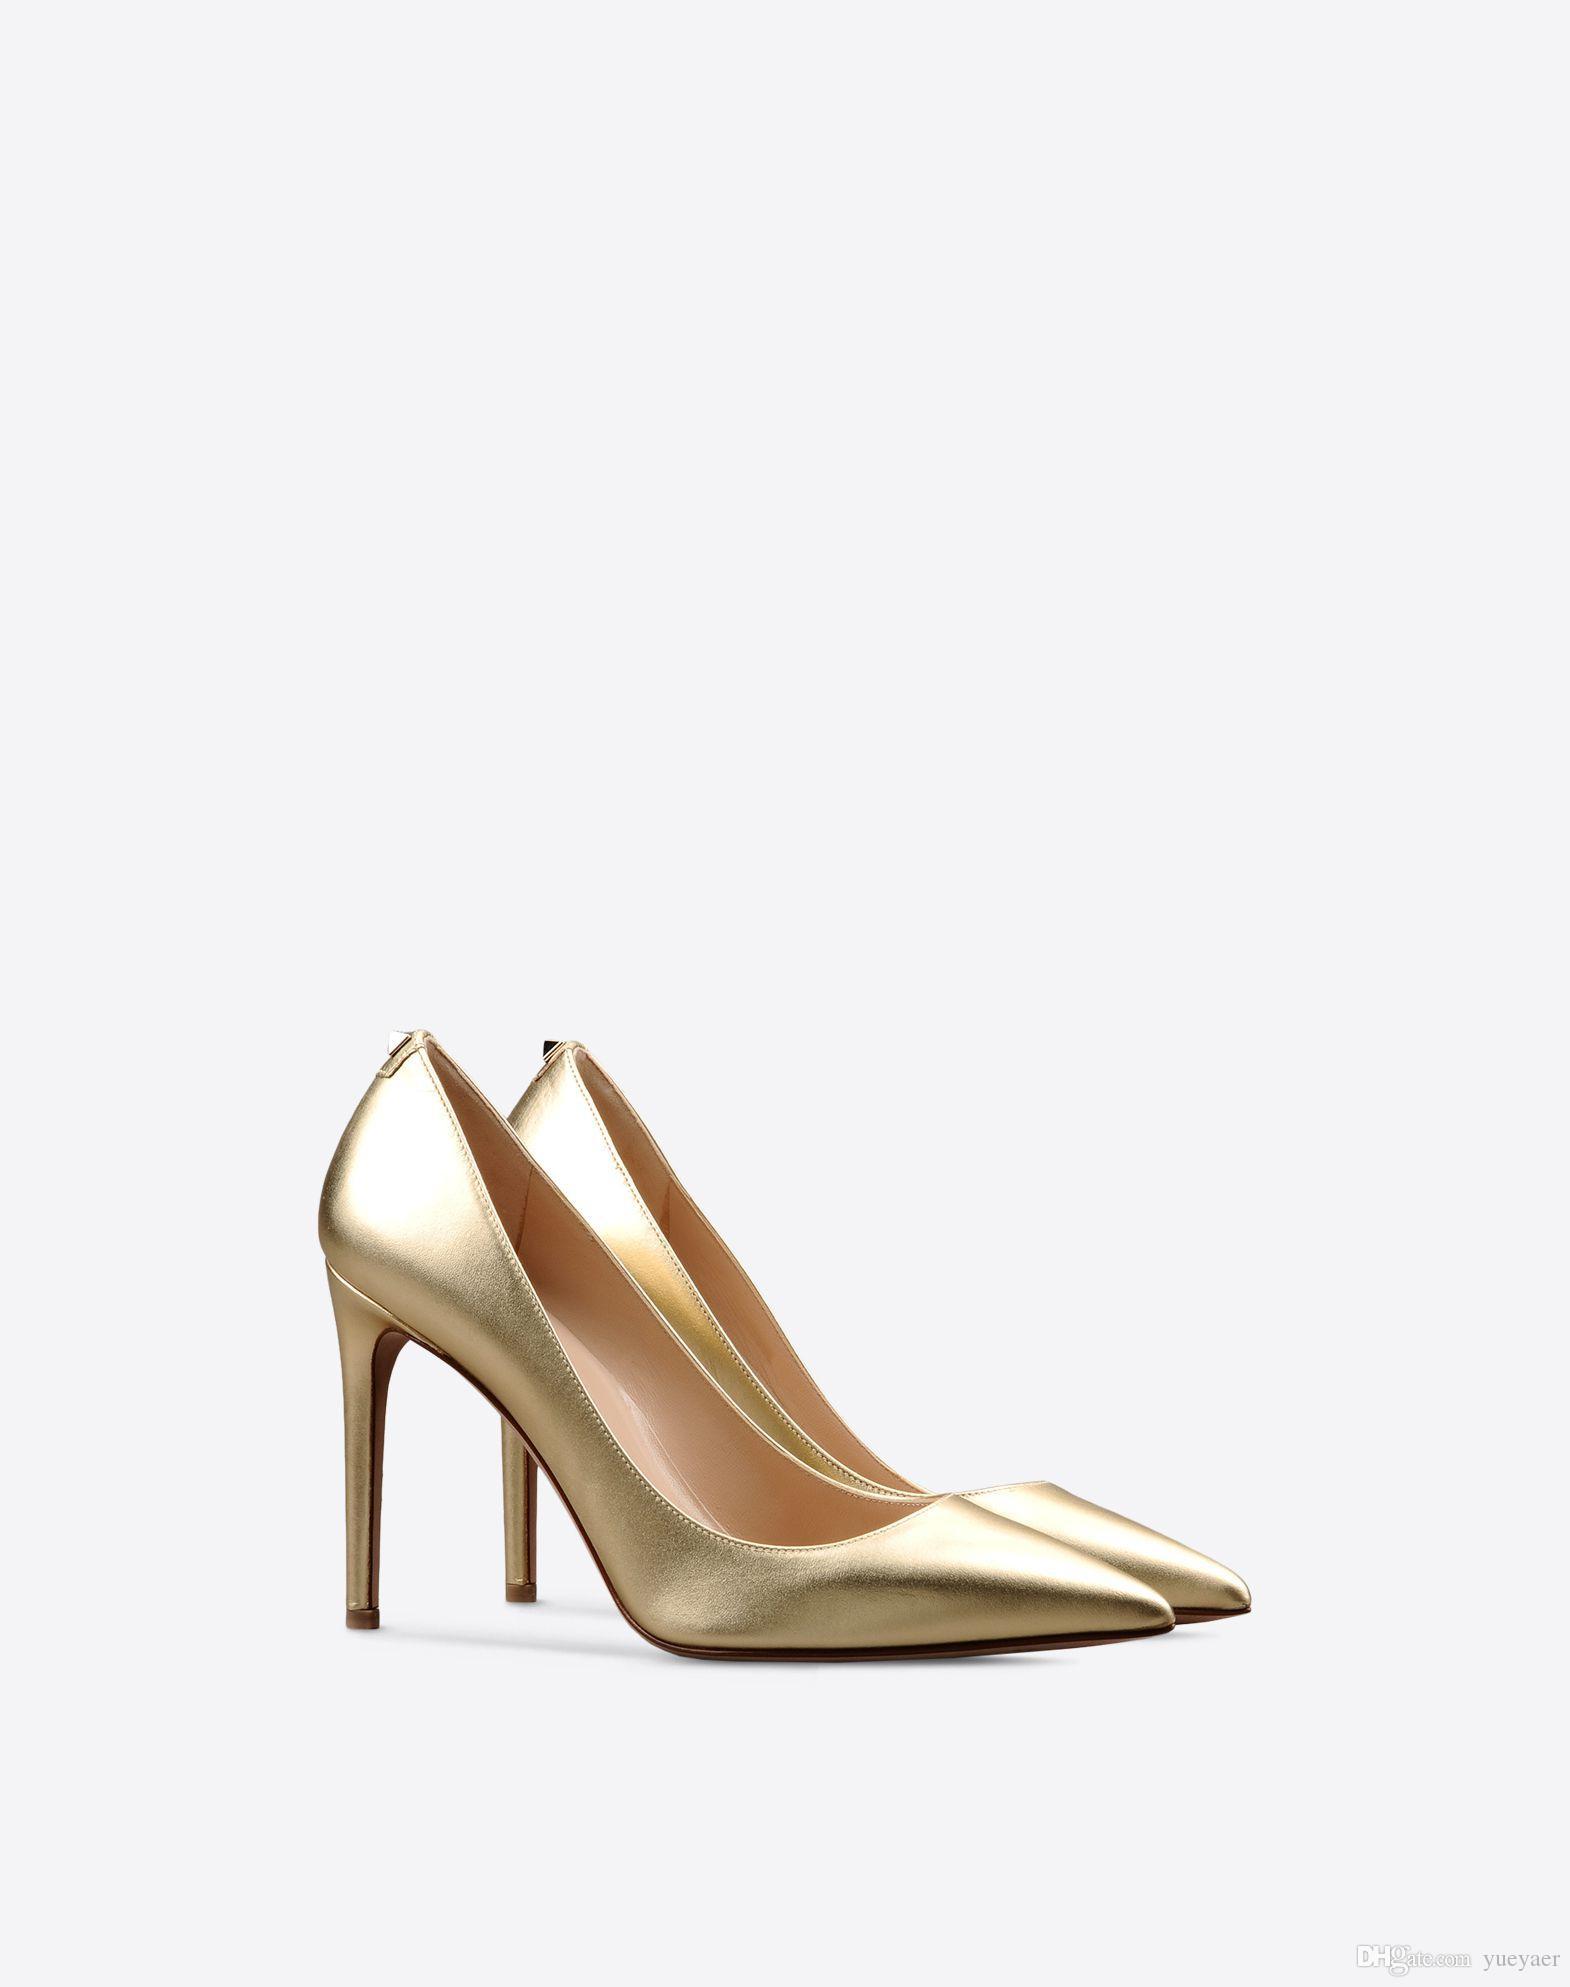 Zandina Womens Handmade Fashion 100mm One Stud Heel Back Pointy Party Office High Heels Pumps Shoes